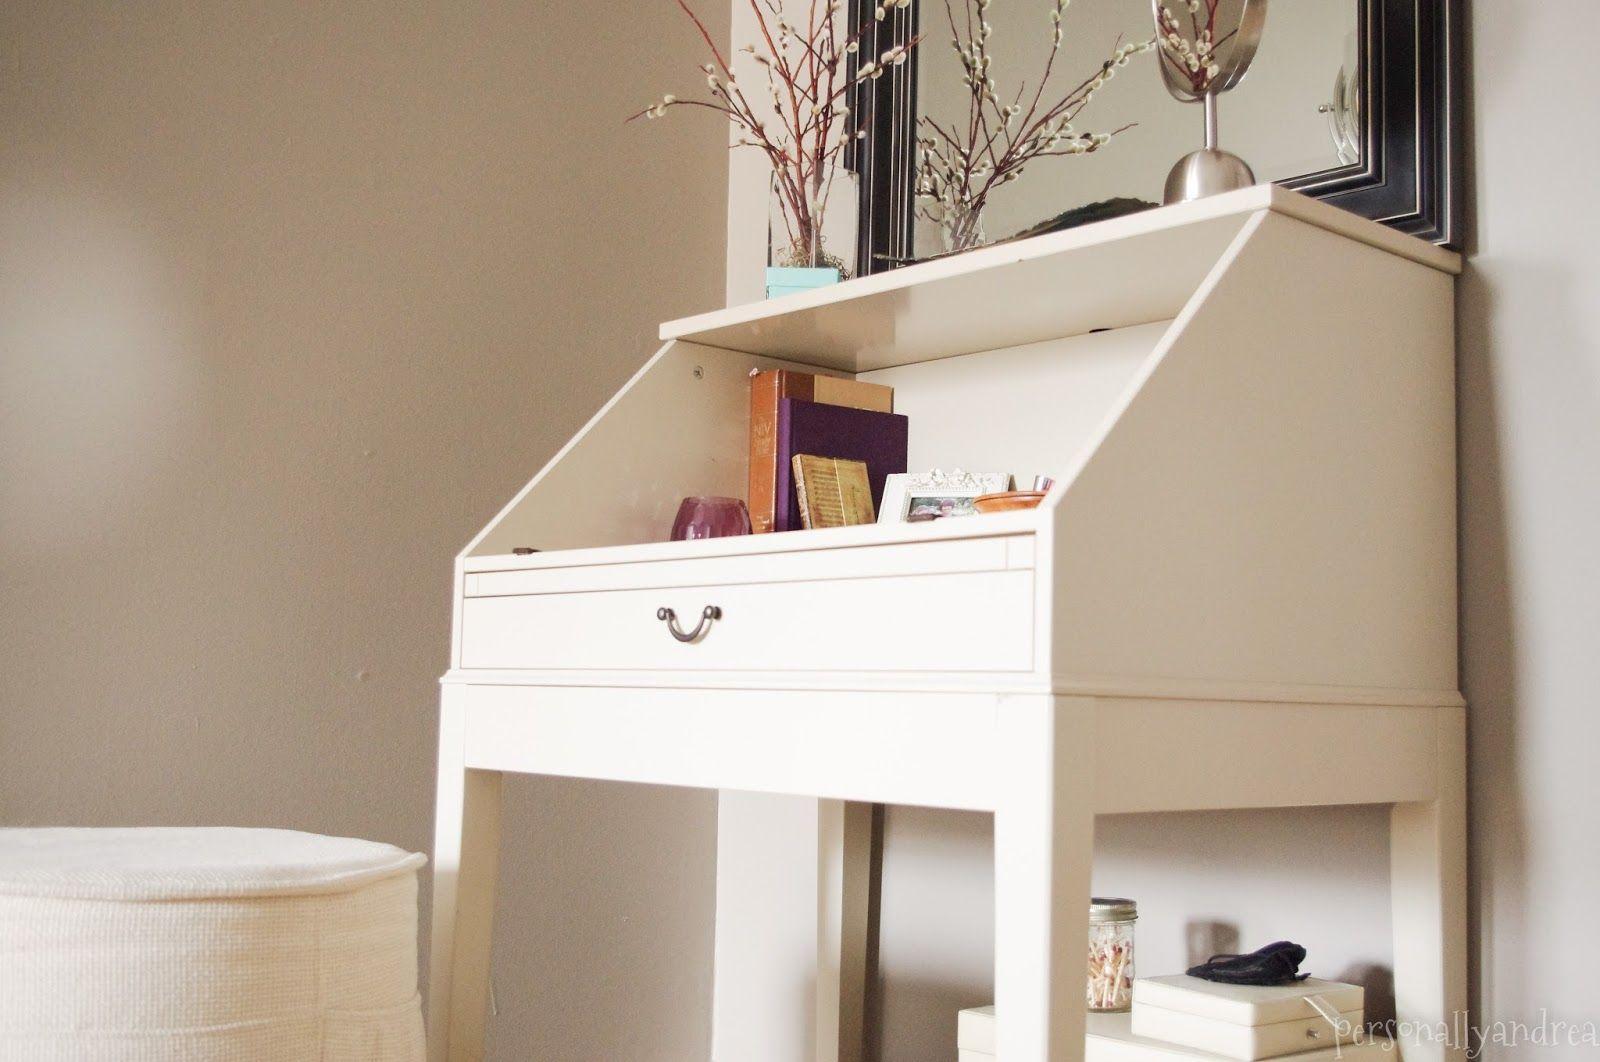 Diy repurposed ikea desk for the home pinterest ikea desk